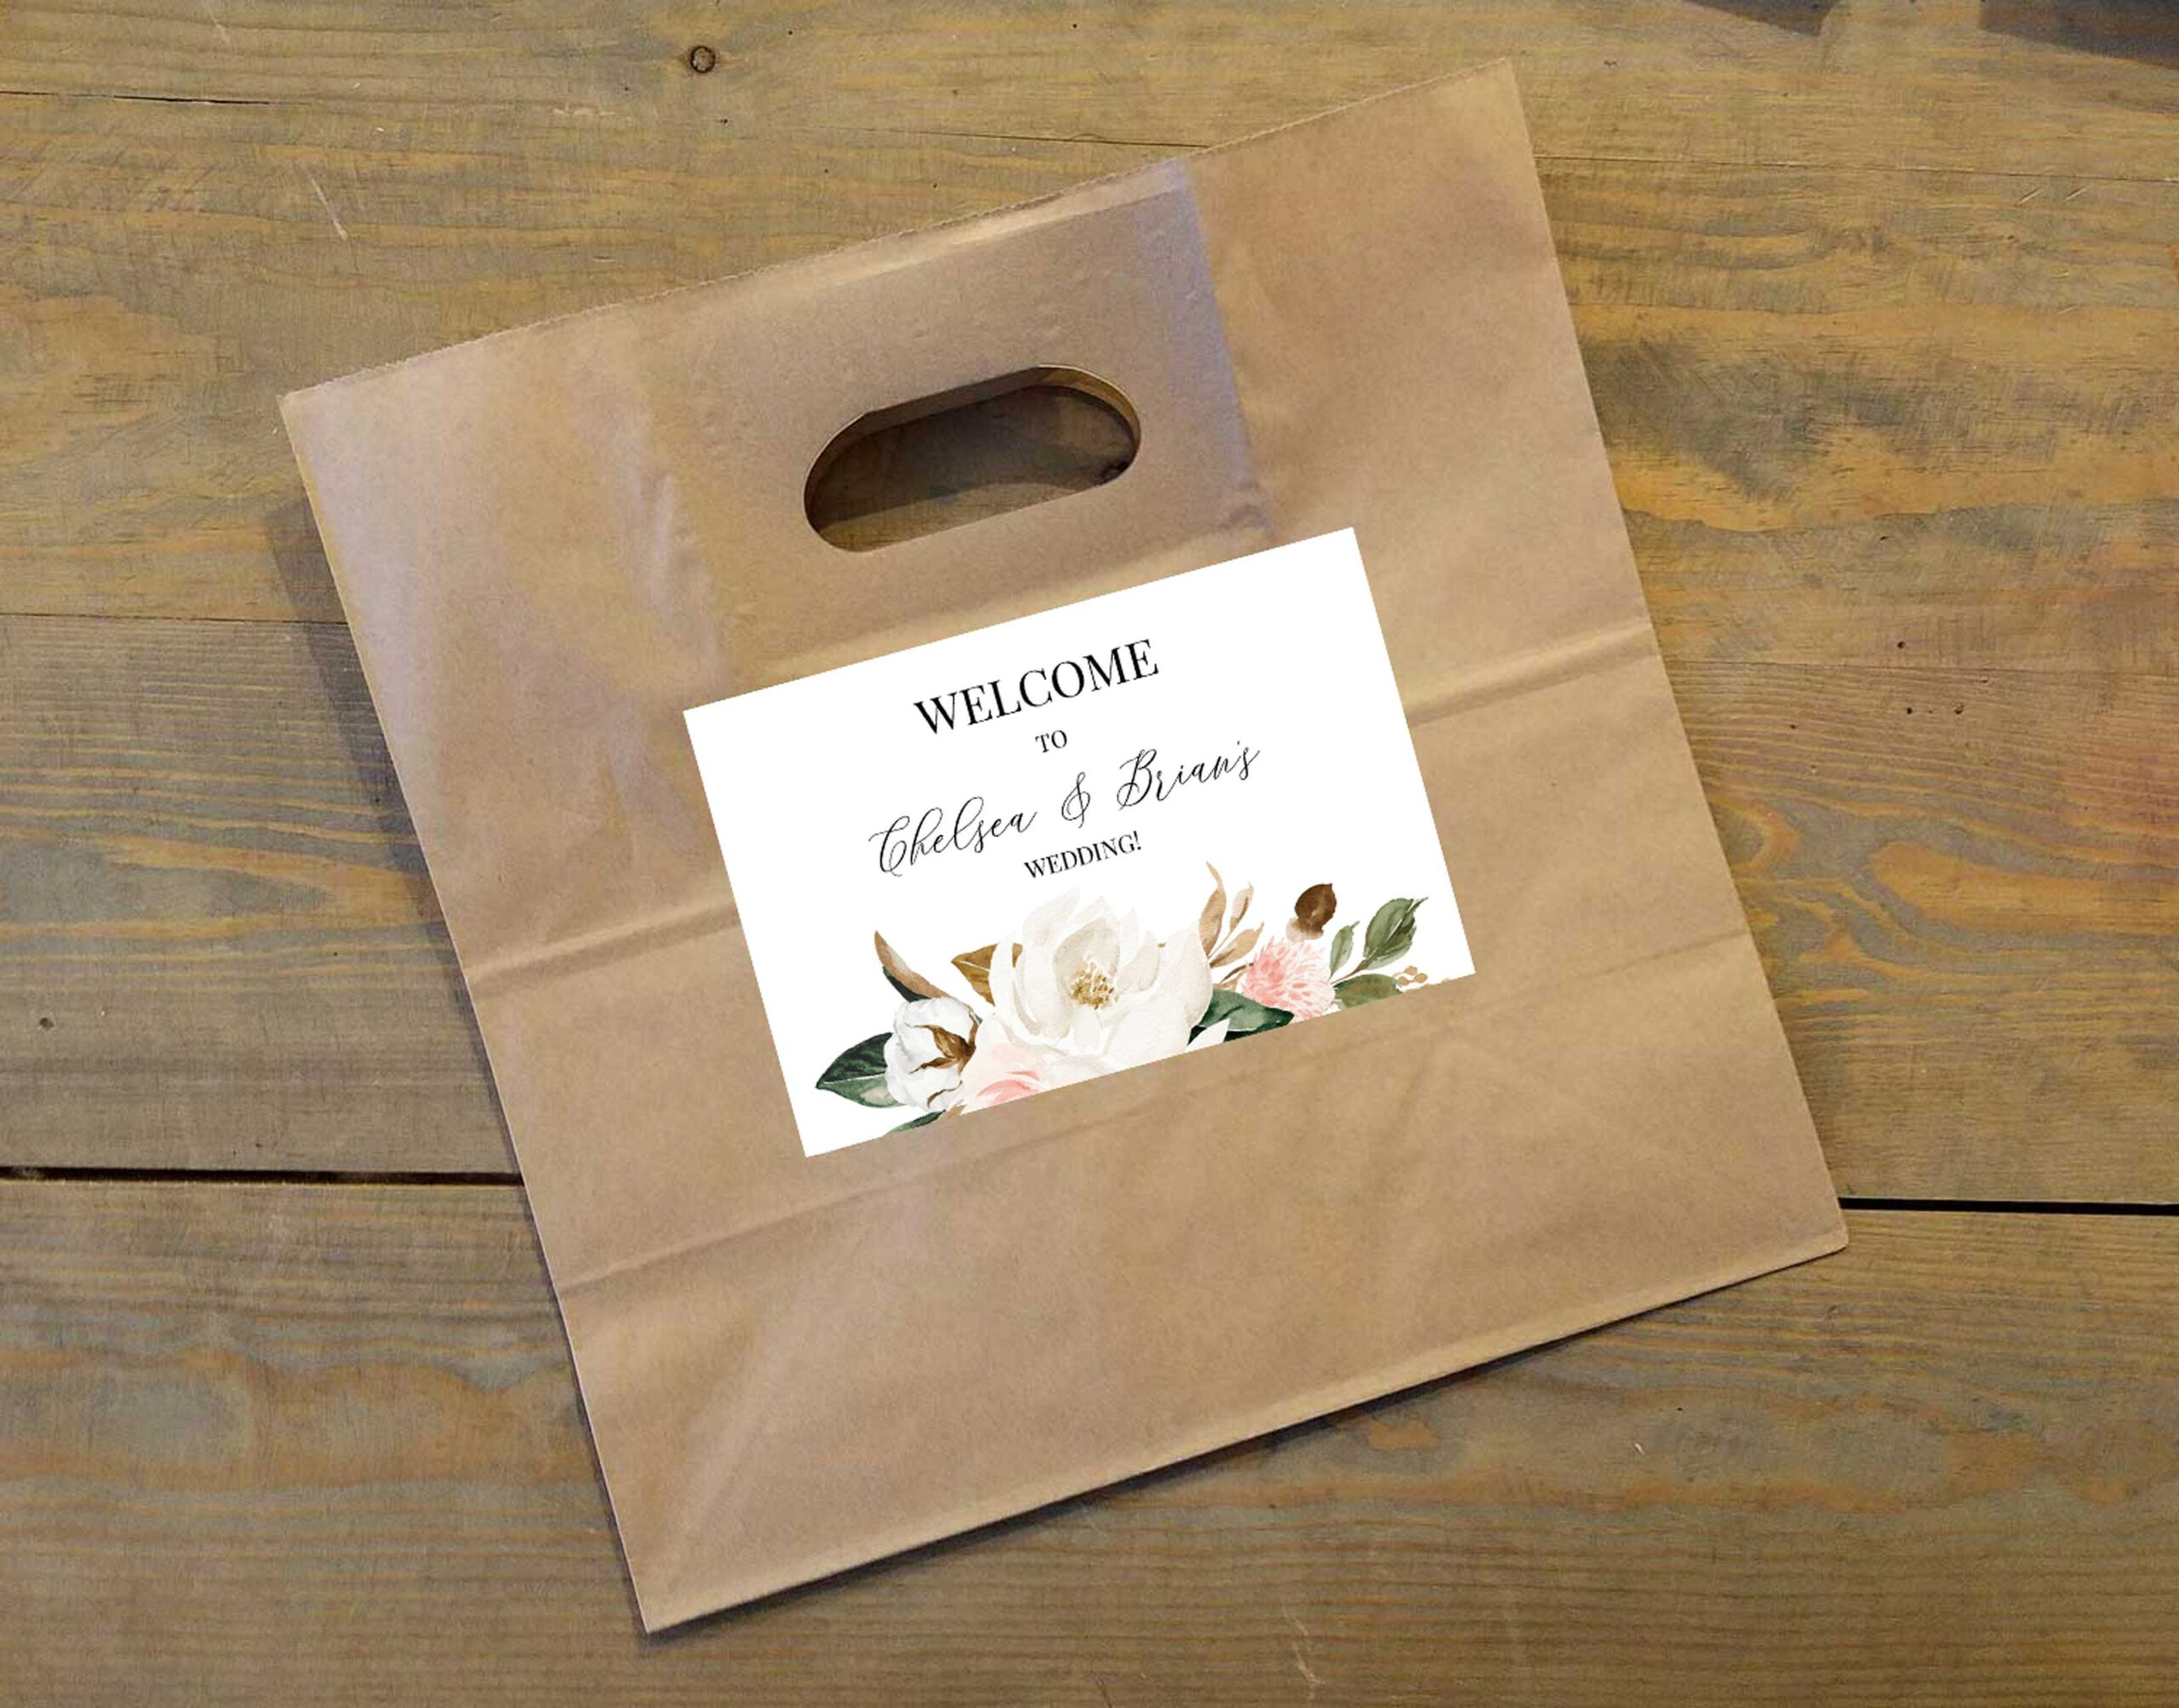 magnolia-wedding-welcome-bag-label-2